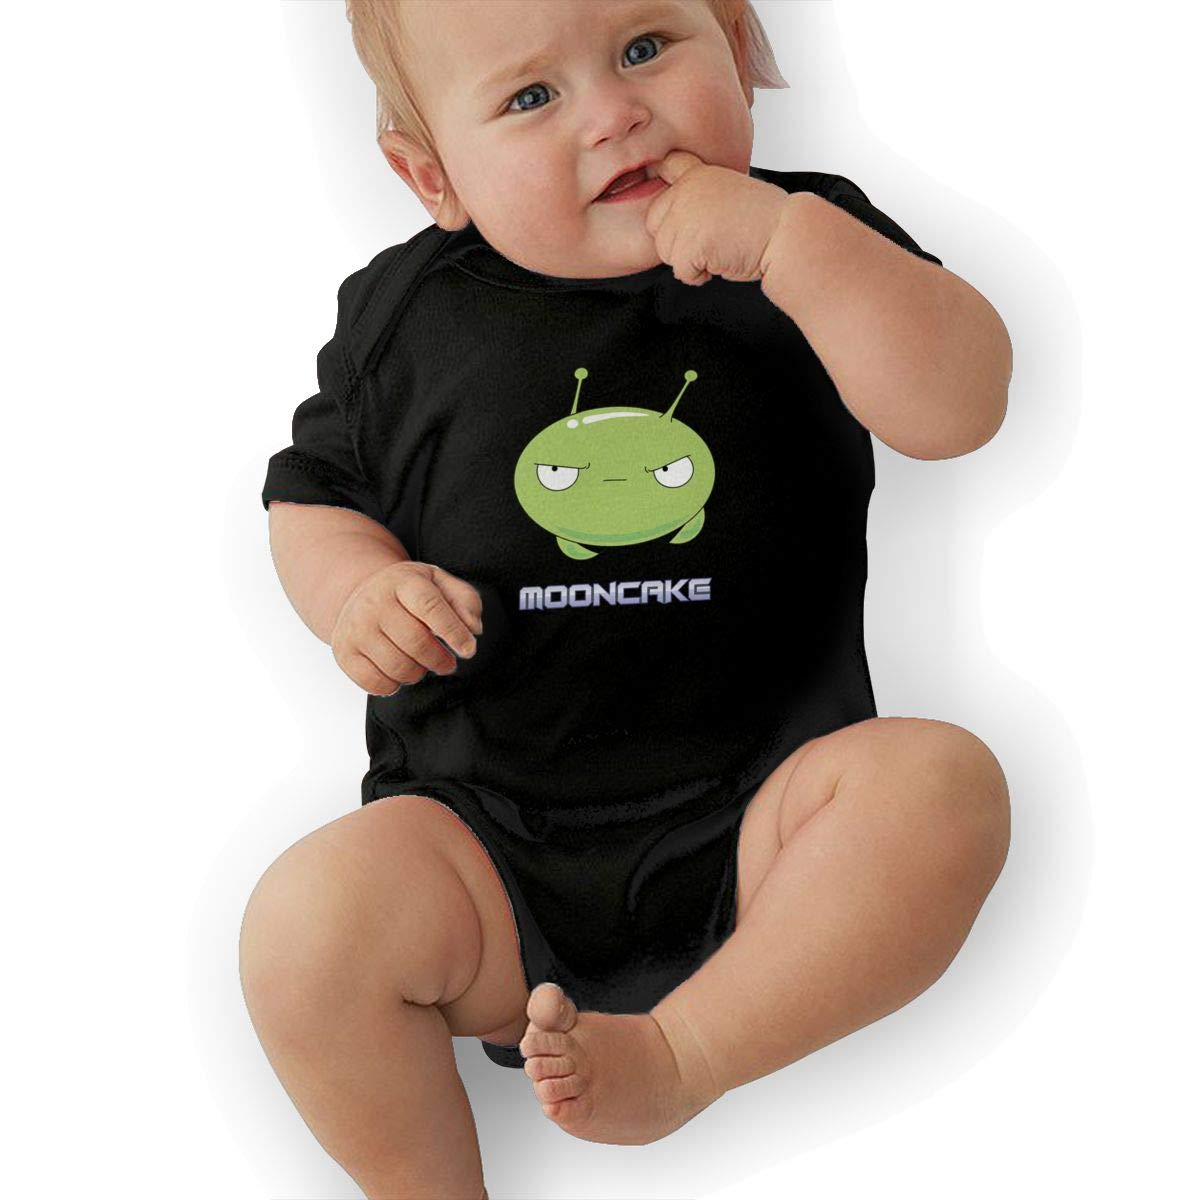 Caterpillar Mooncake Baby Romper 0-18 Months Newborn Baby Girls Boys Layette Rompers Black